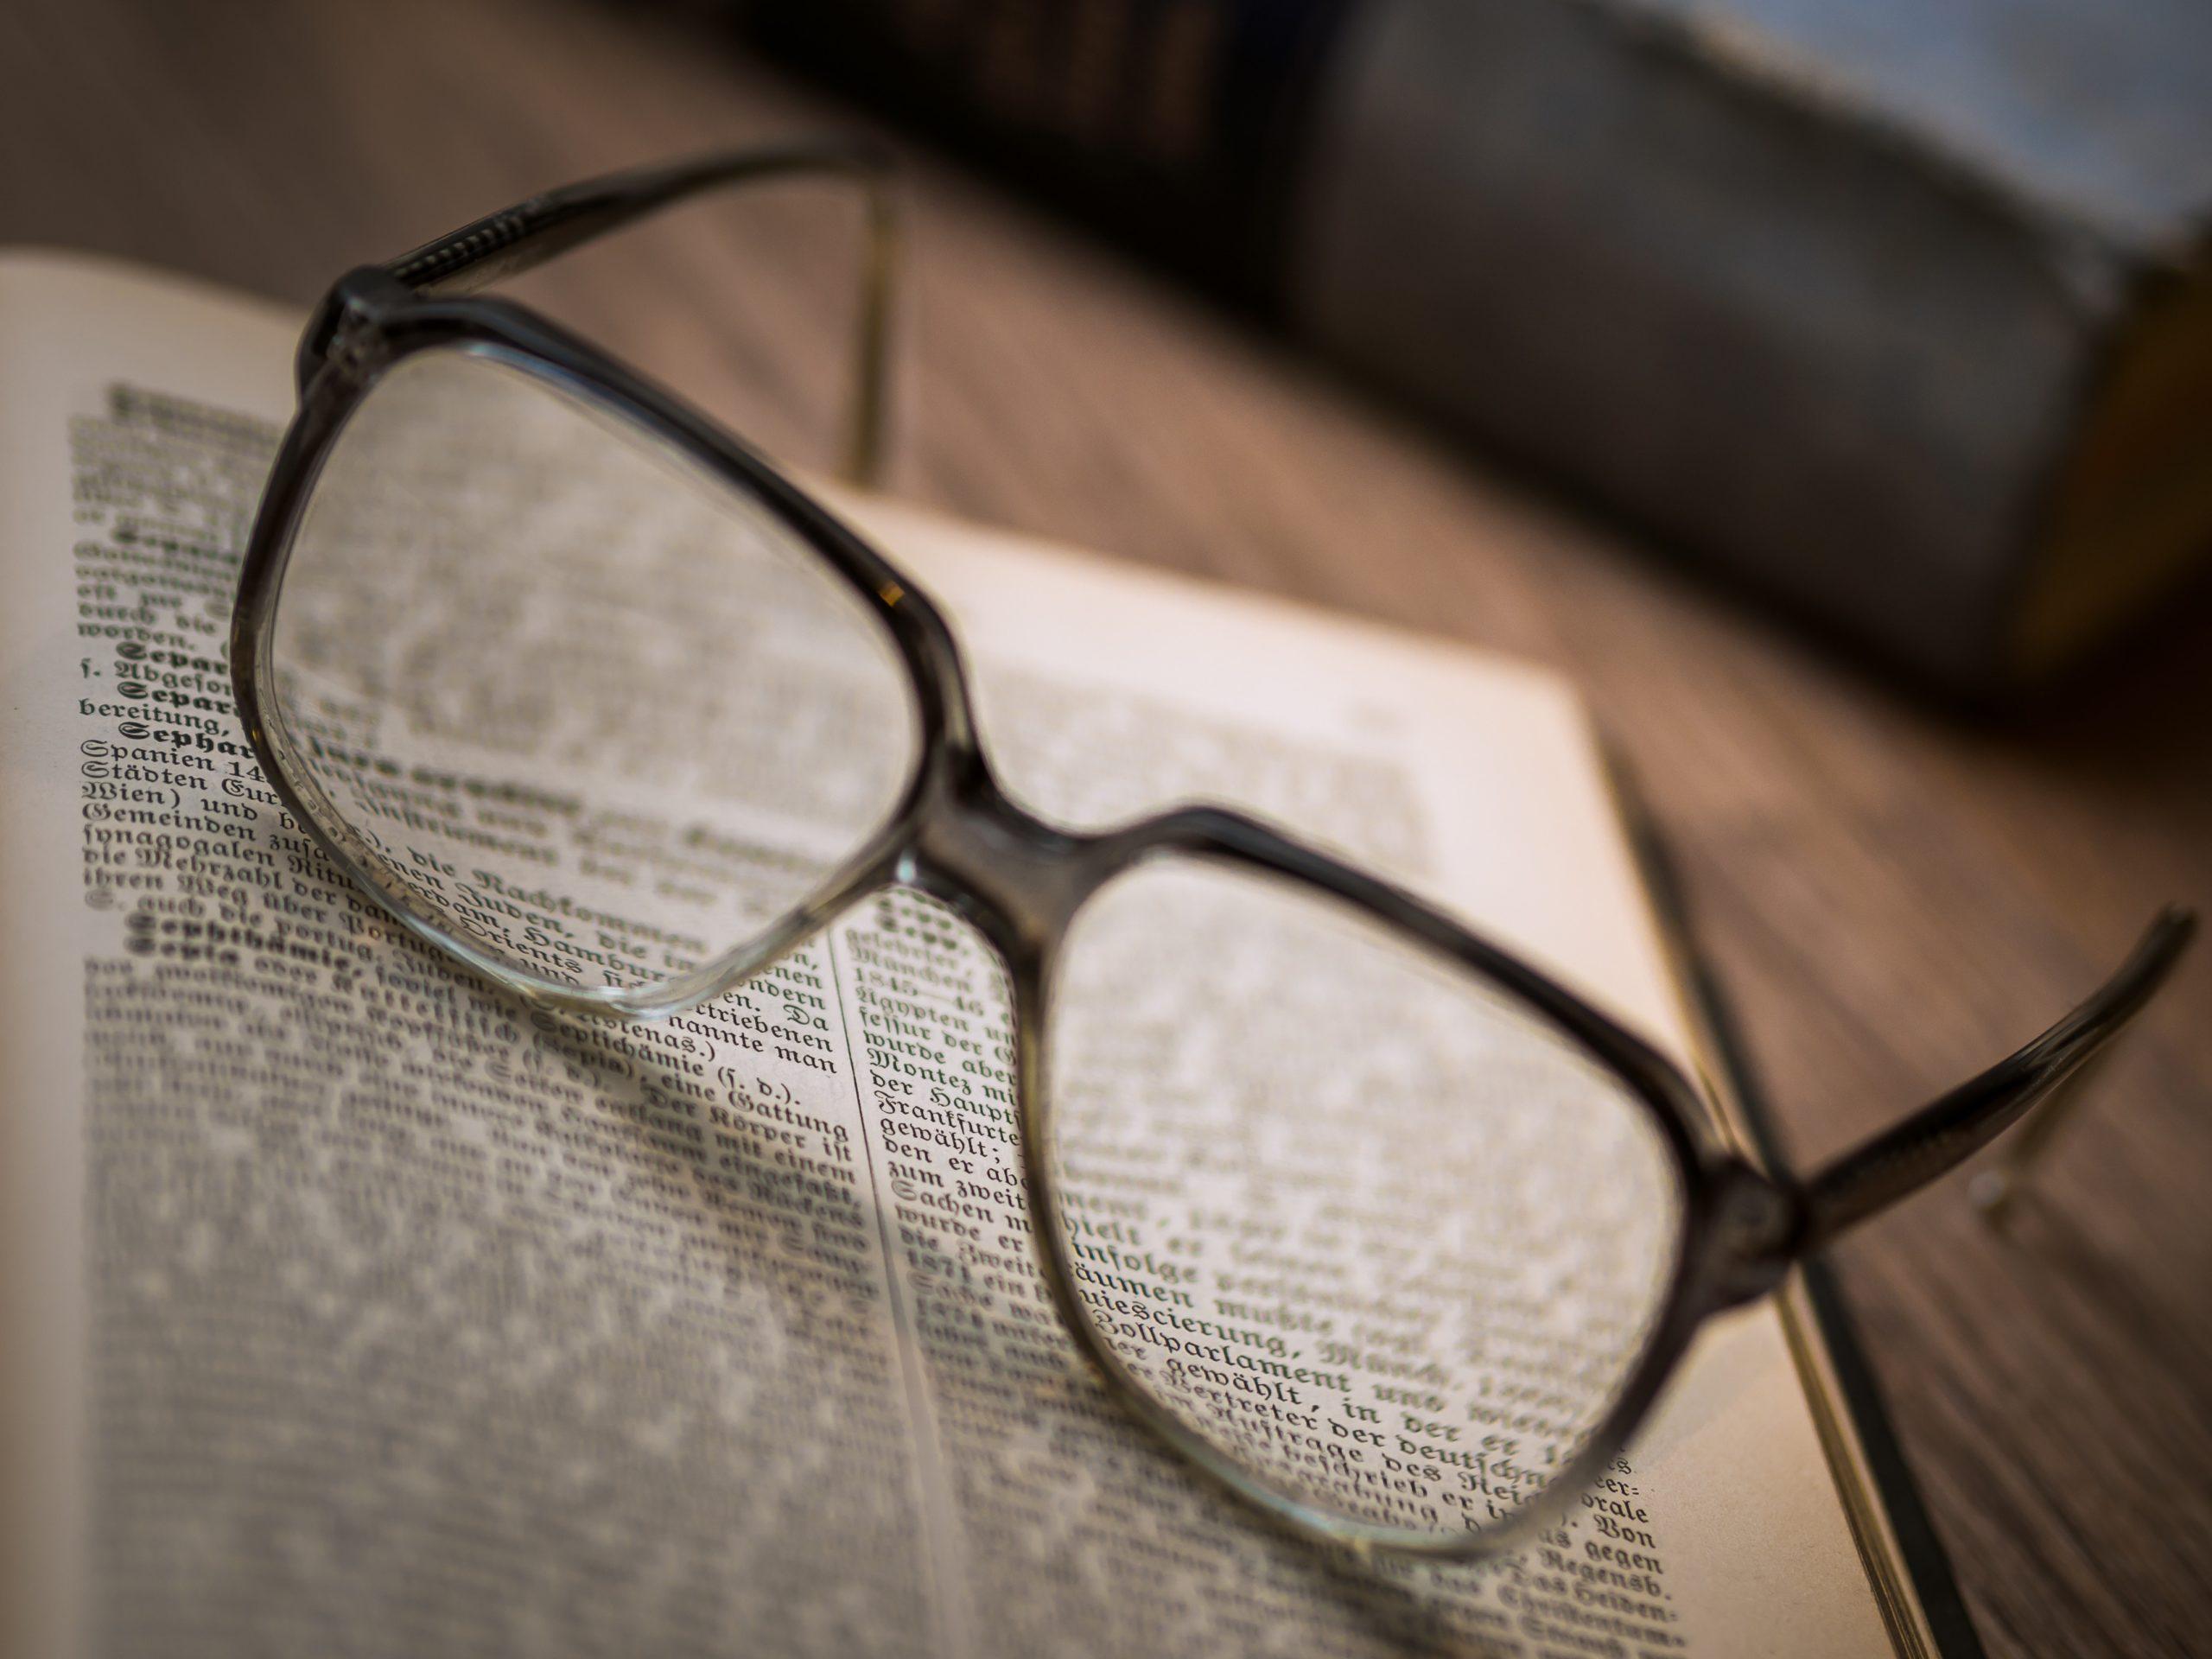 Eyesight maintenance